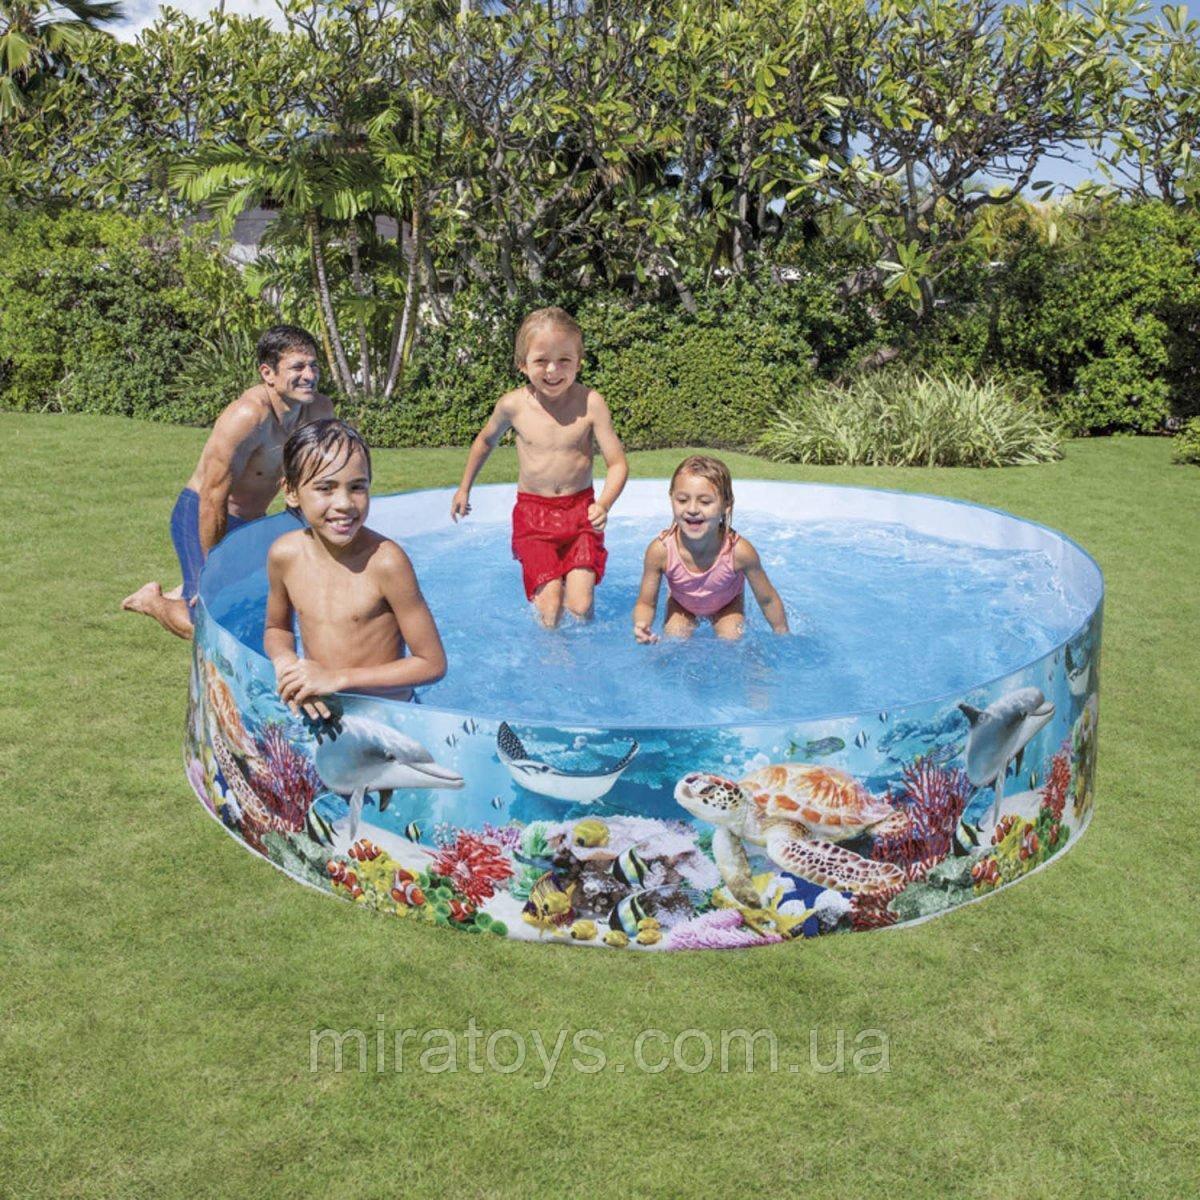 ✅Басейн дитячий надувний Intex 58472 «Океанський риф», 244 х 46 см